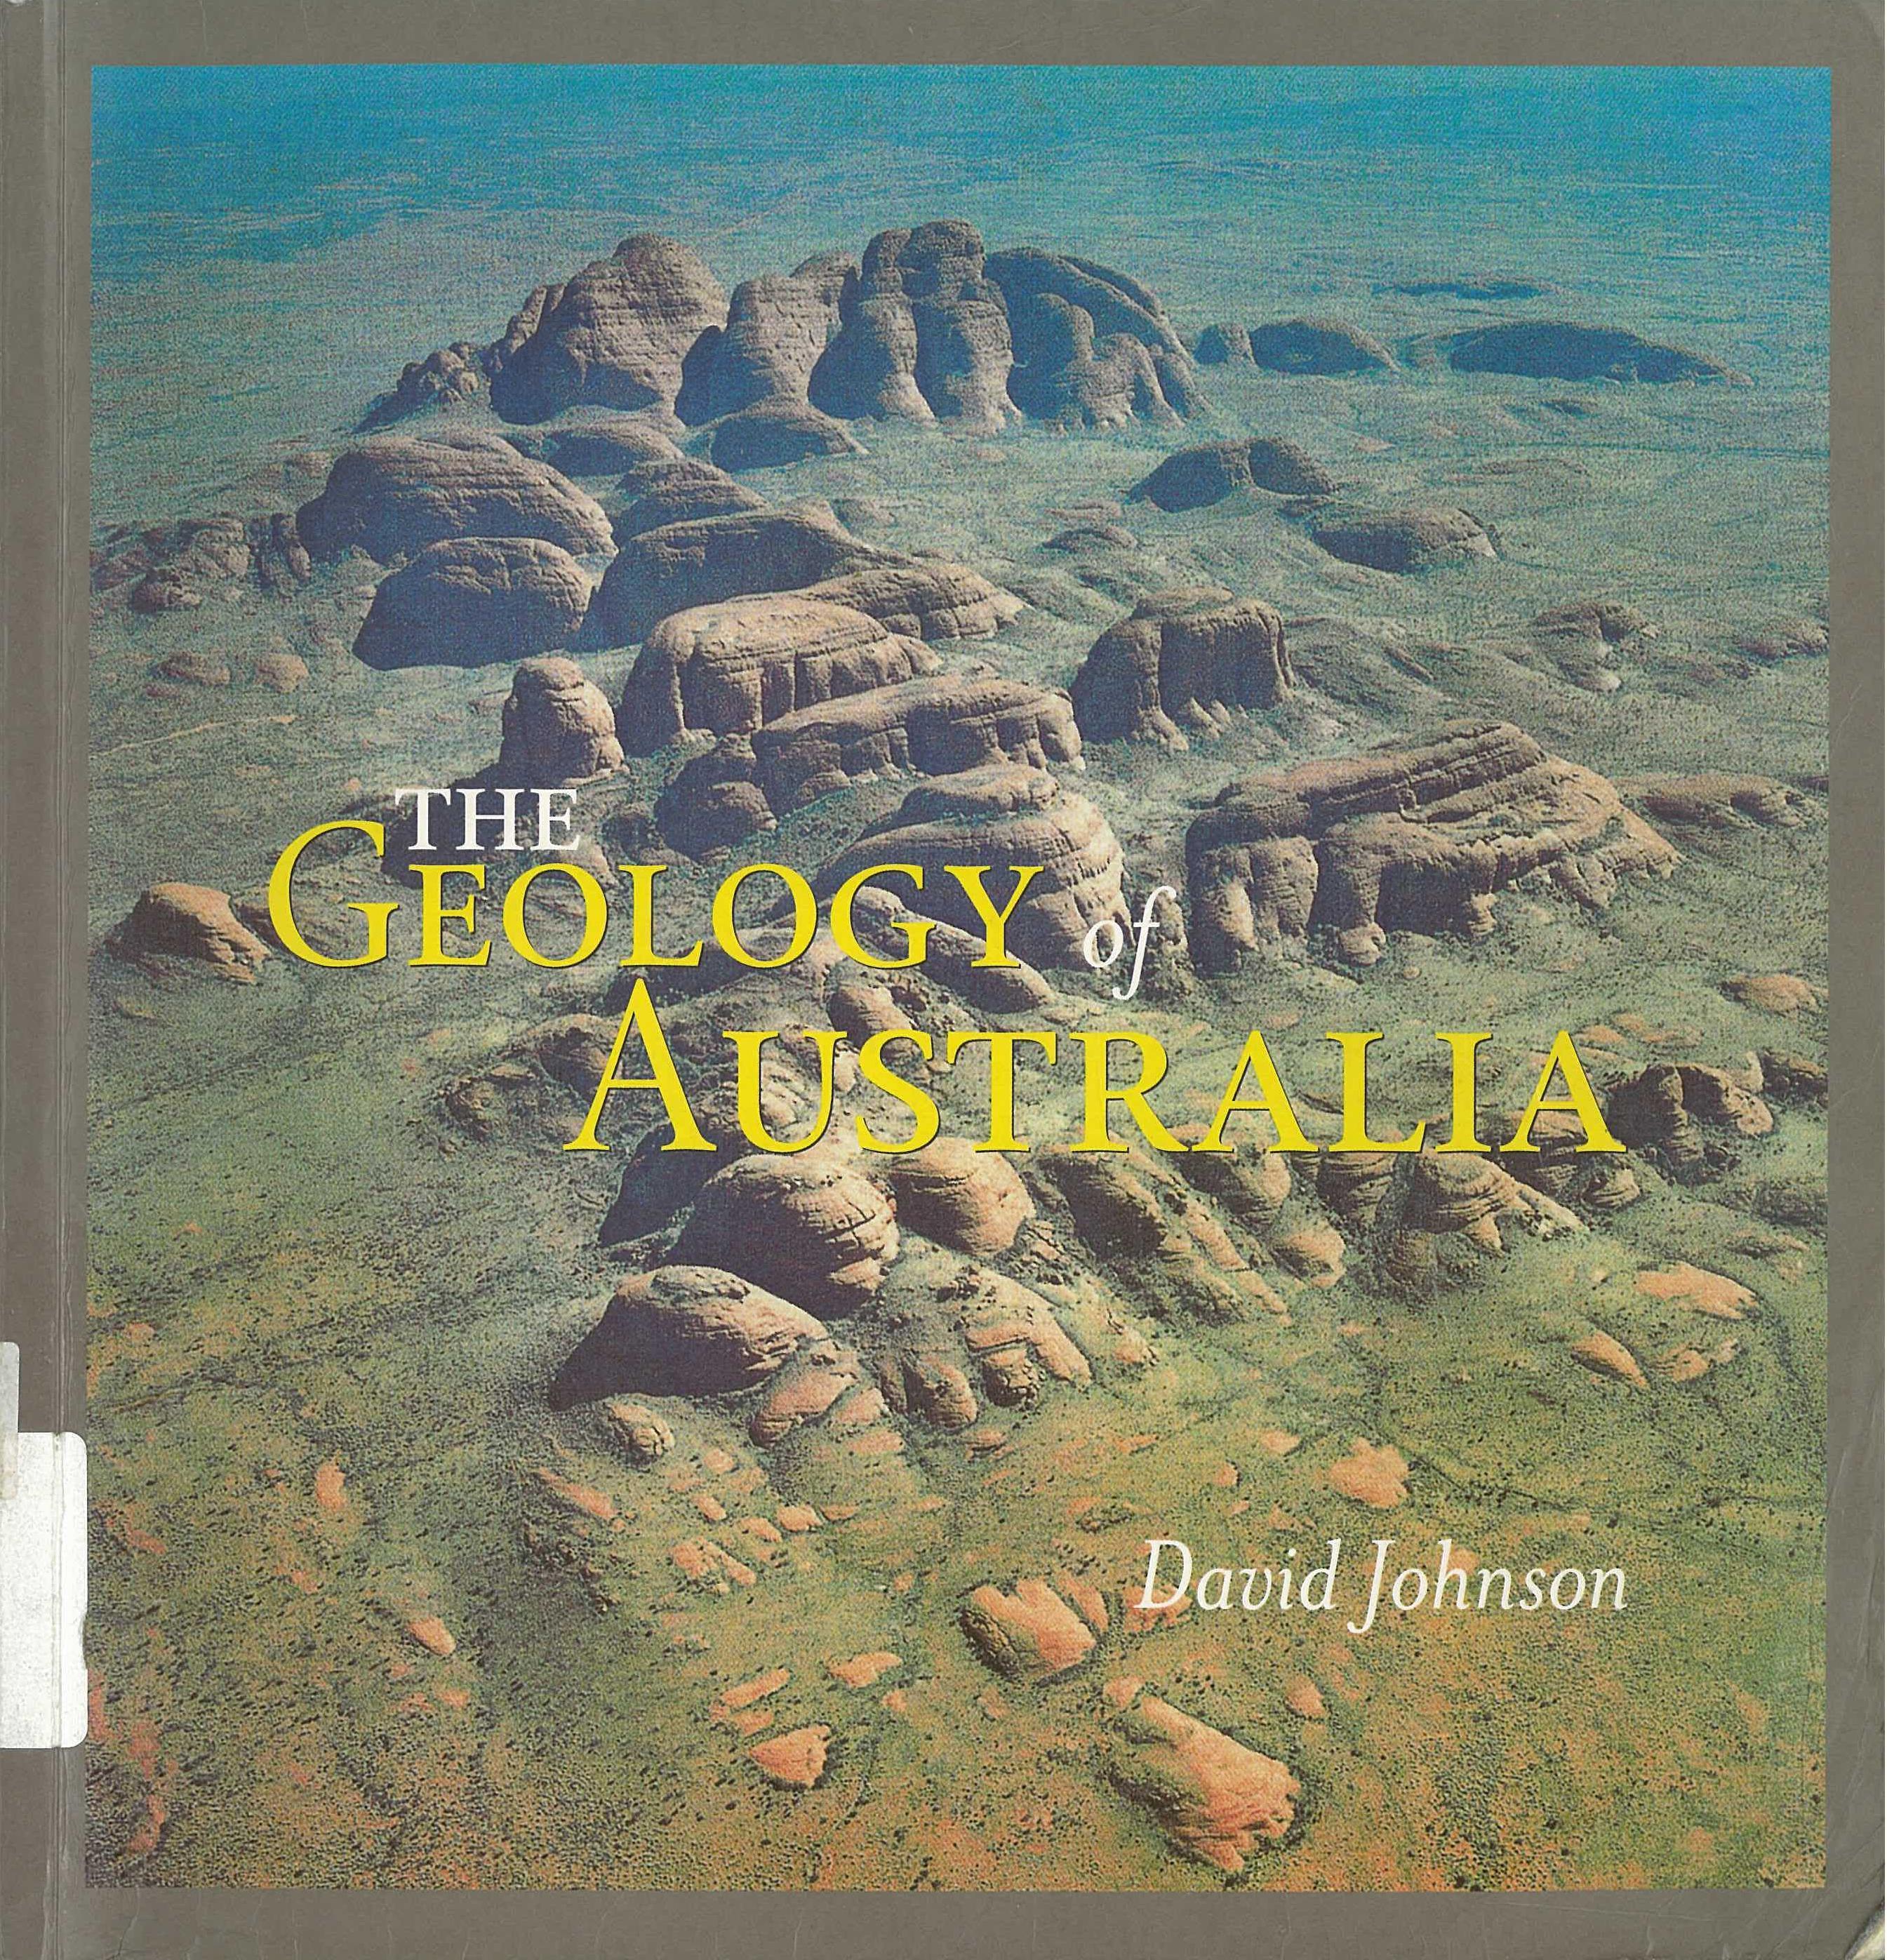 The Geology of Australia